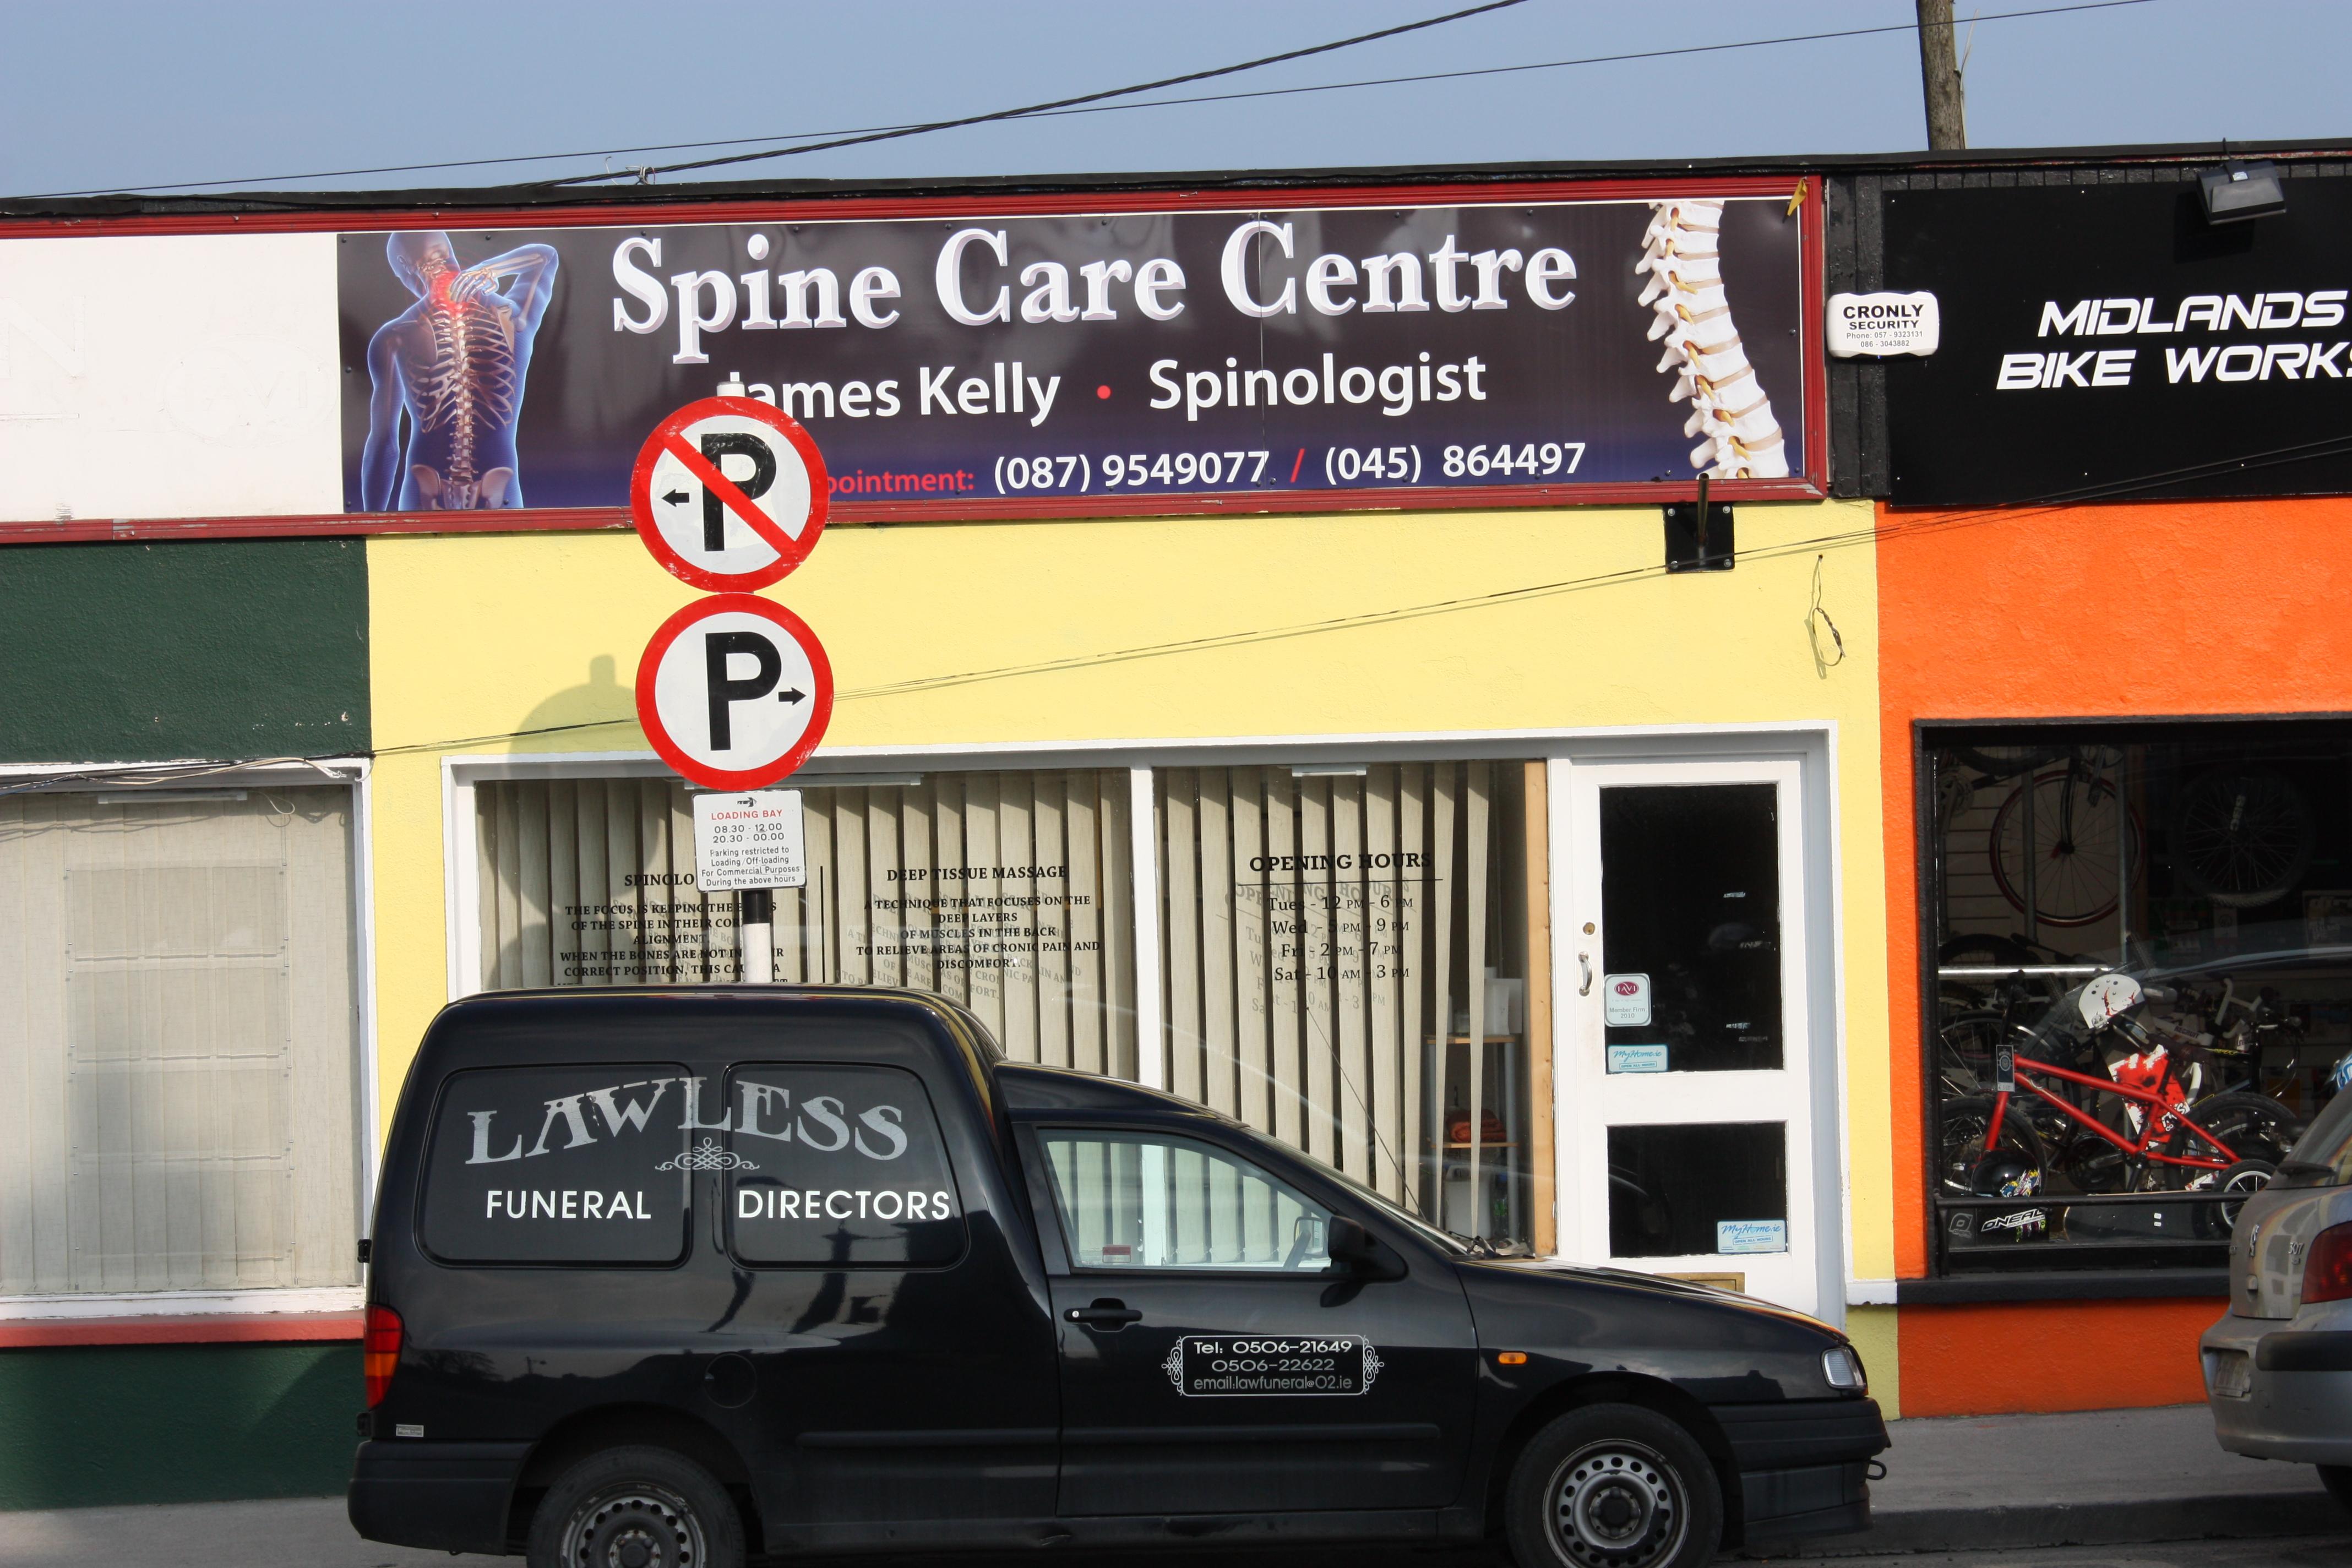 File:Spine Care Centre, Tullamore, March 2011 JPG